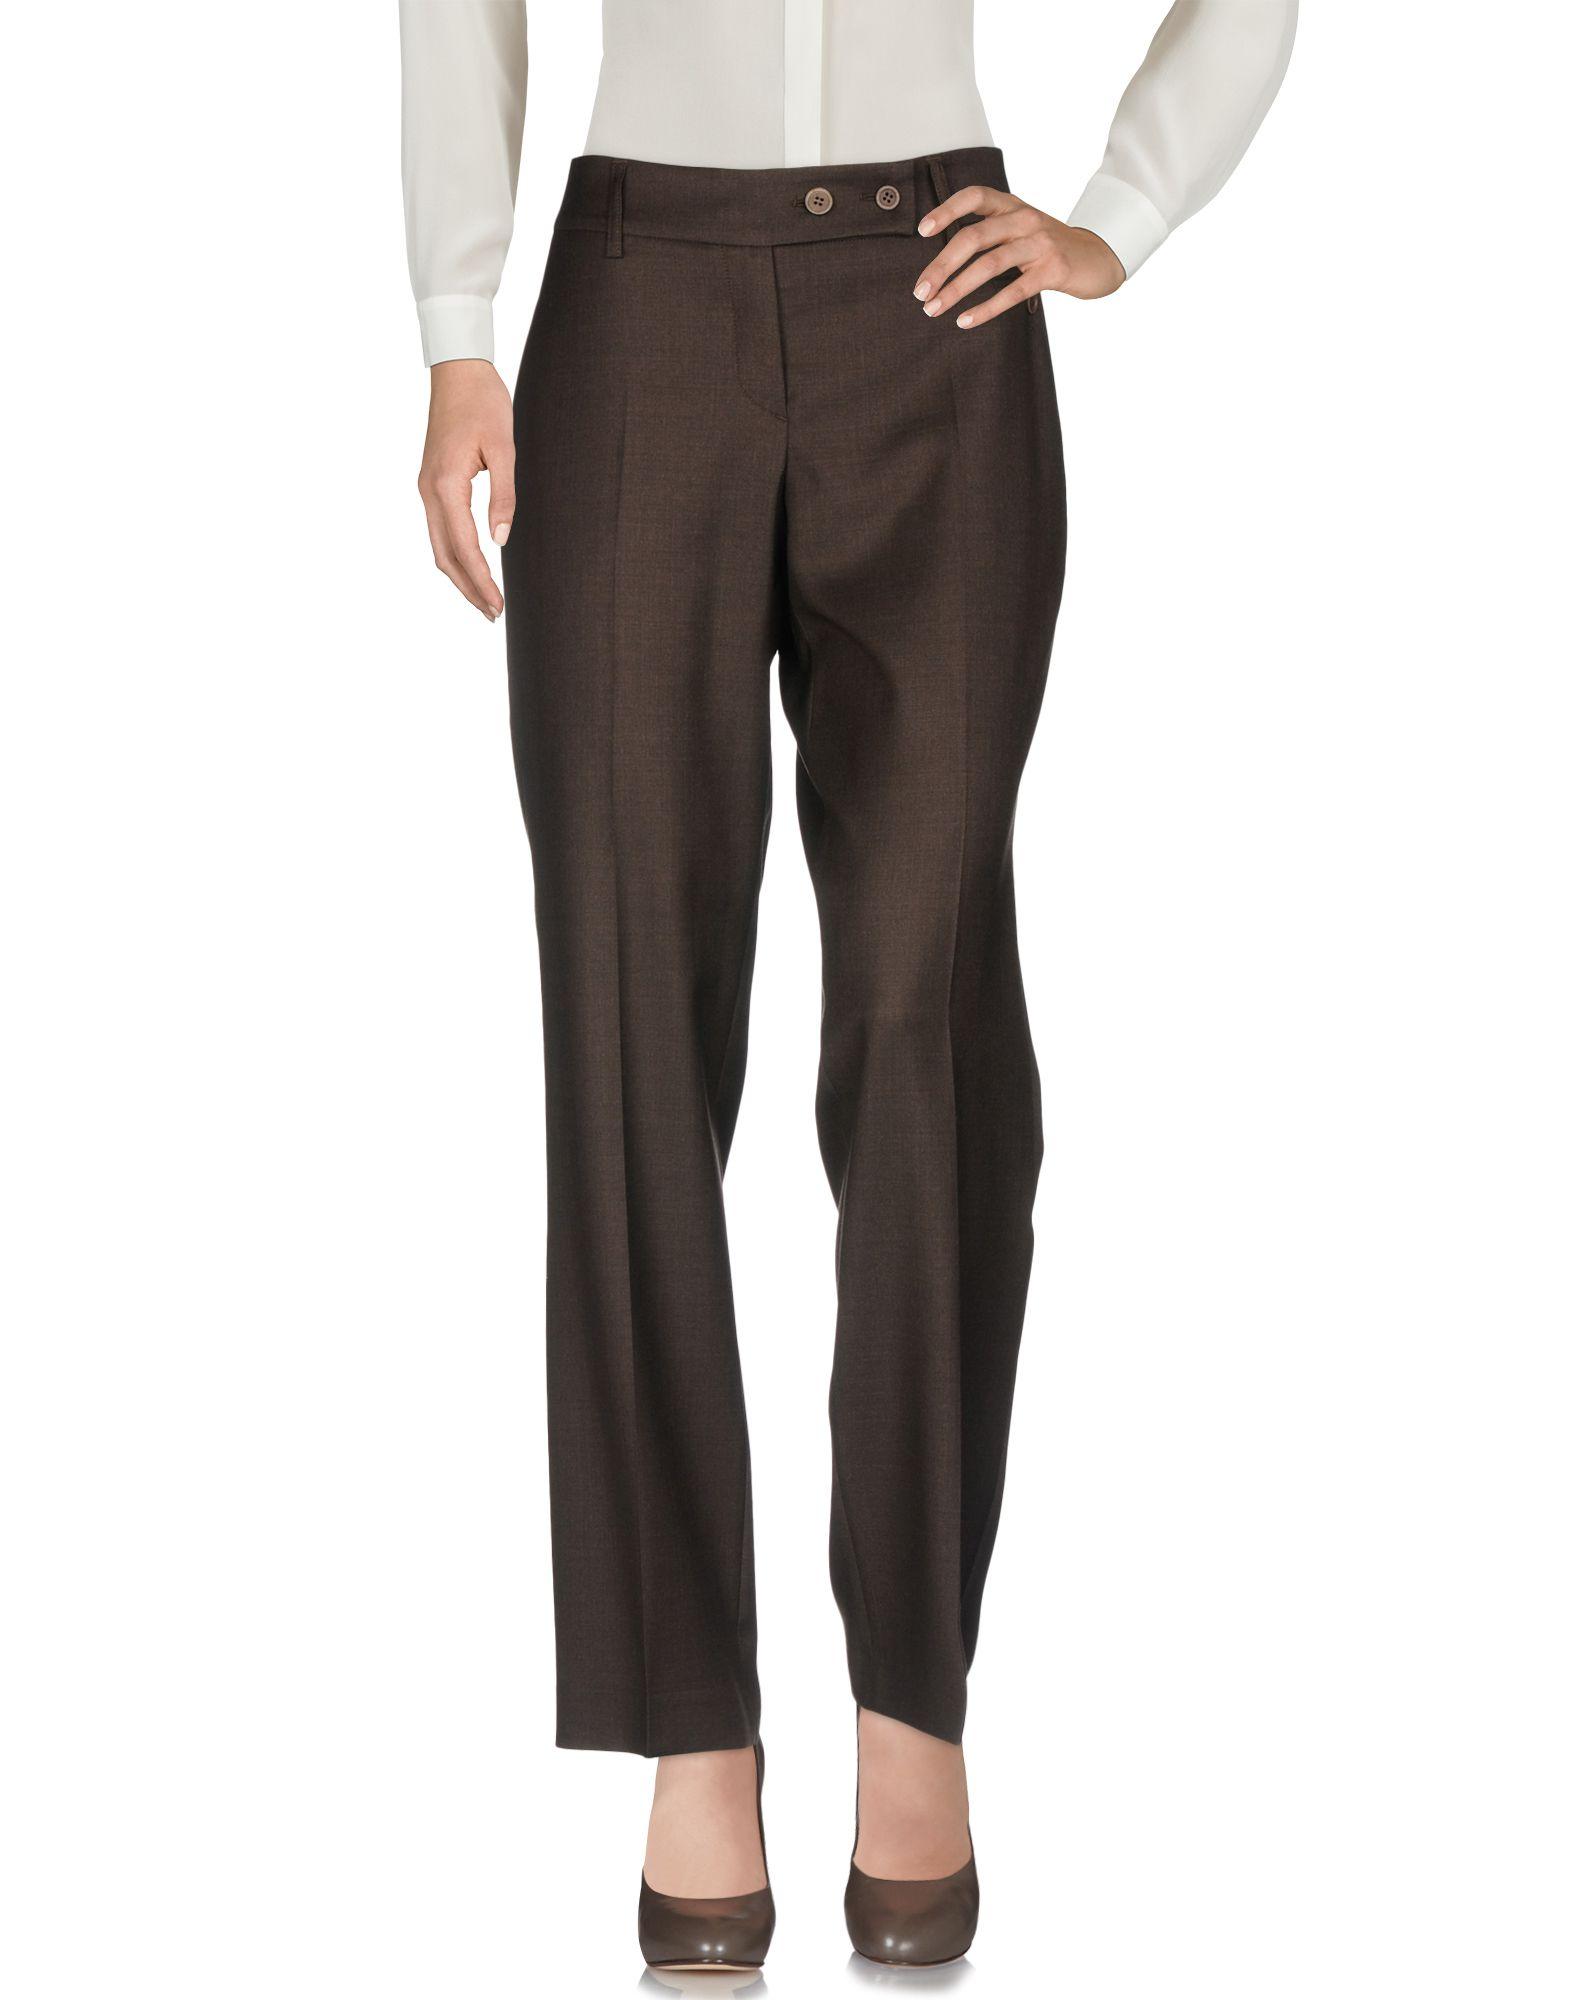 Pantalone Gunex Donna - Acquista online su LBcCdFNV9o